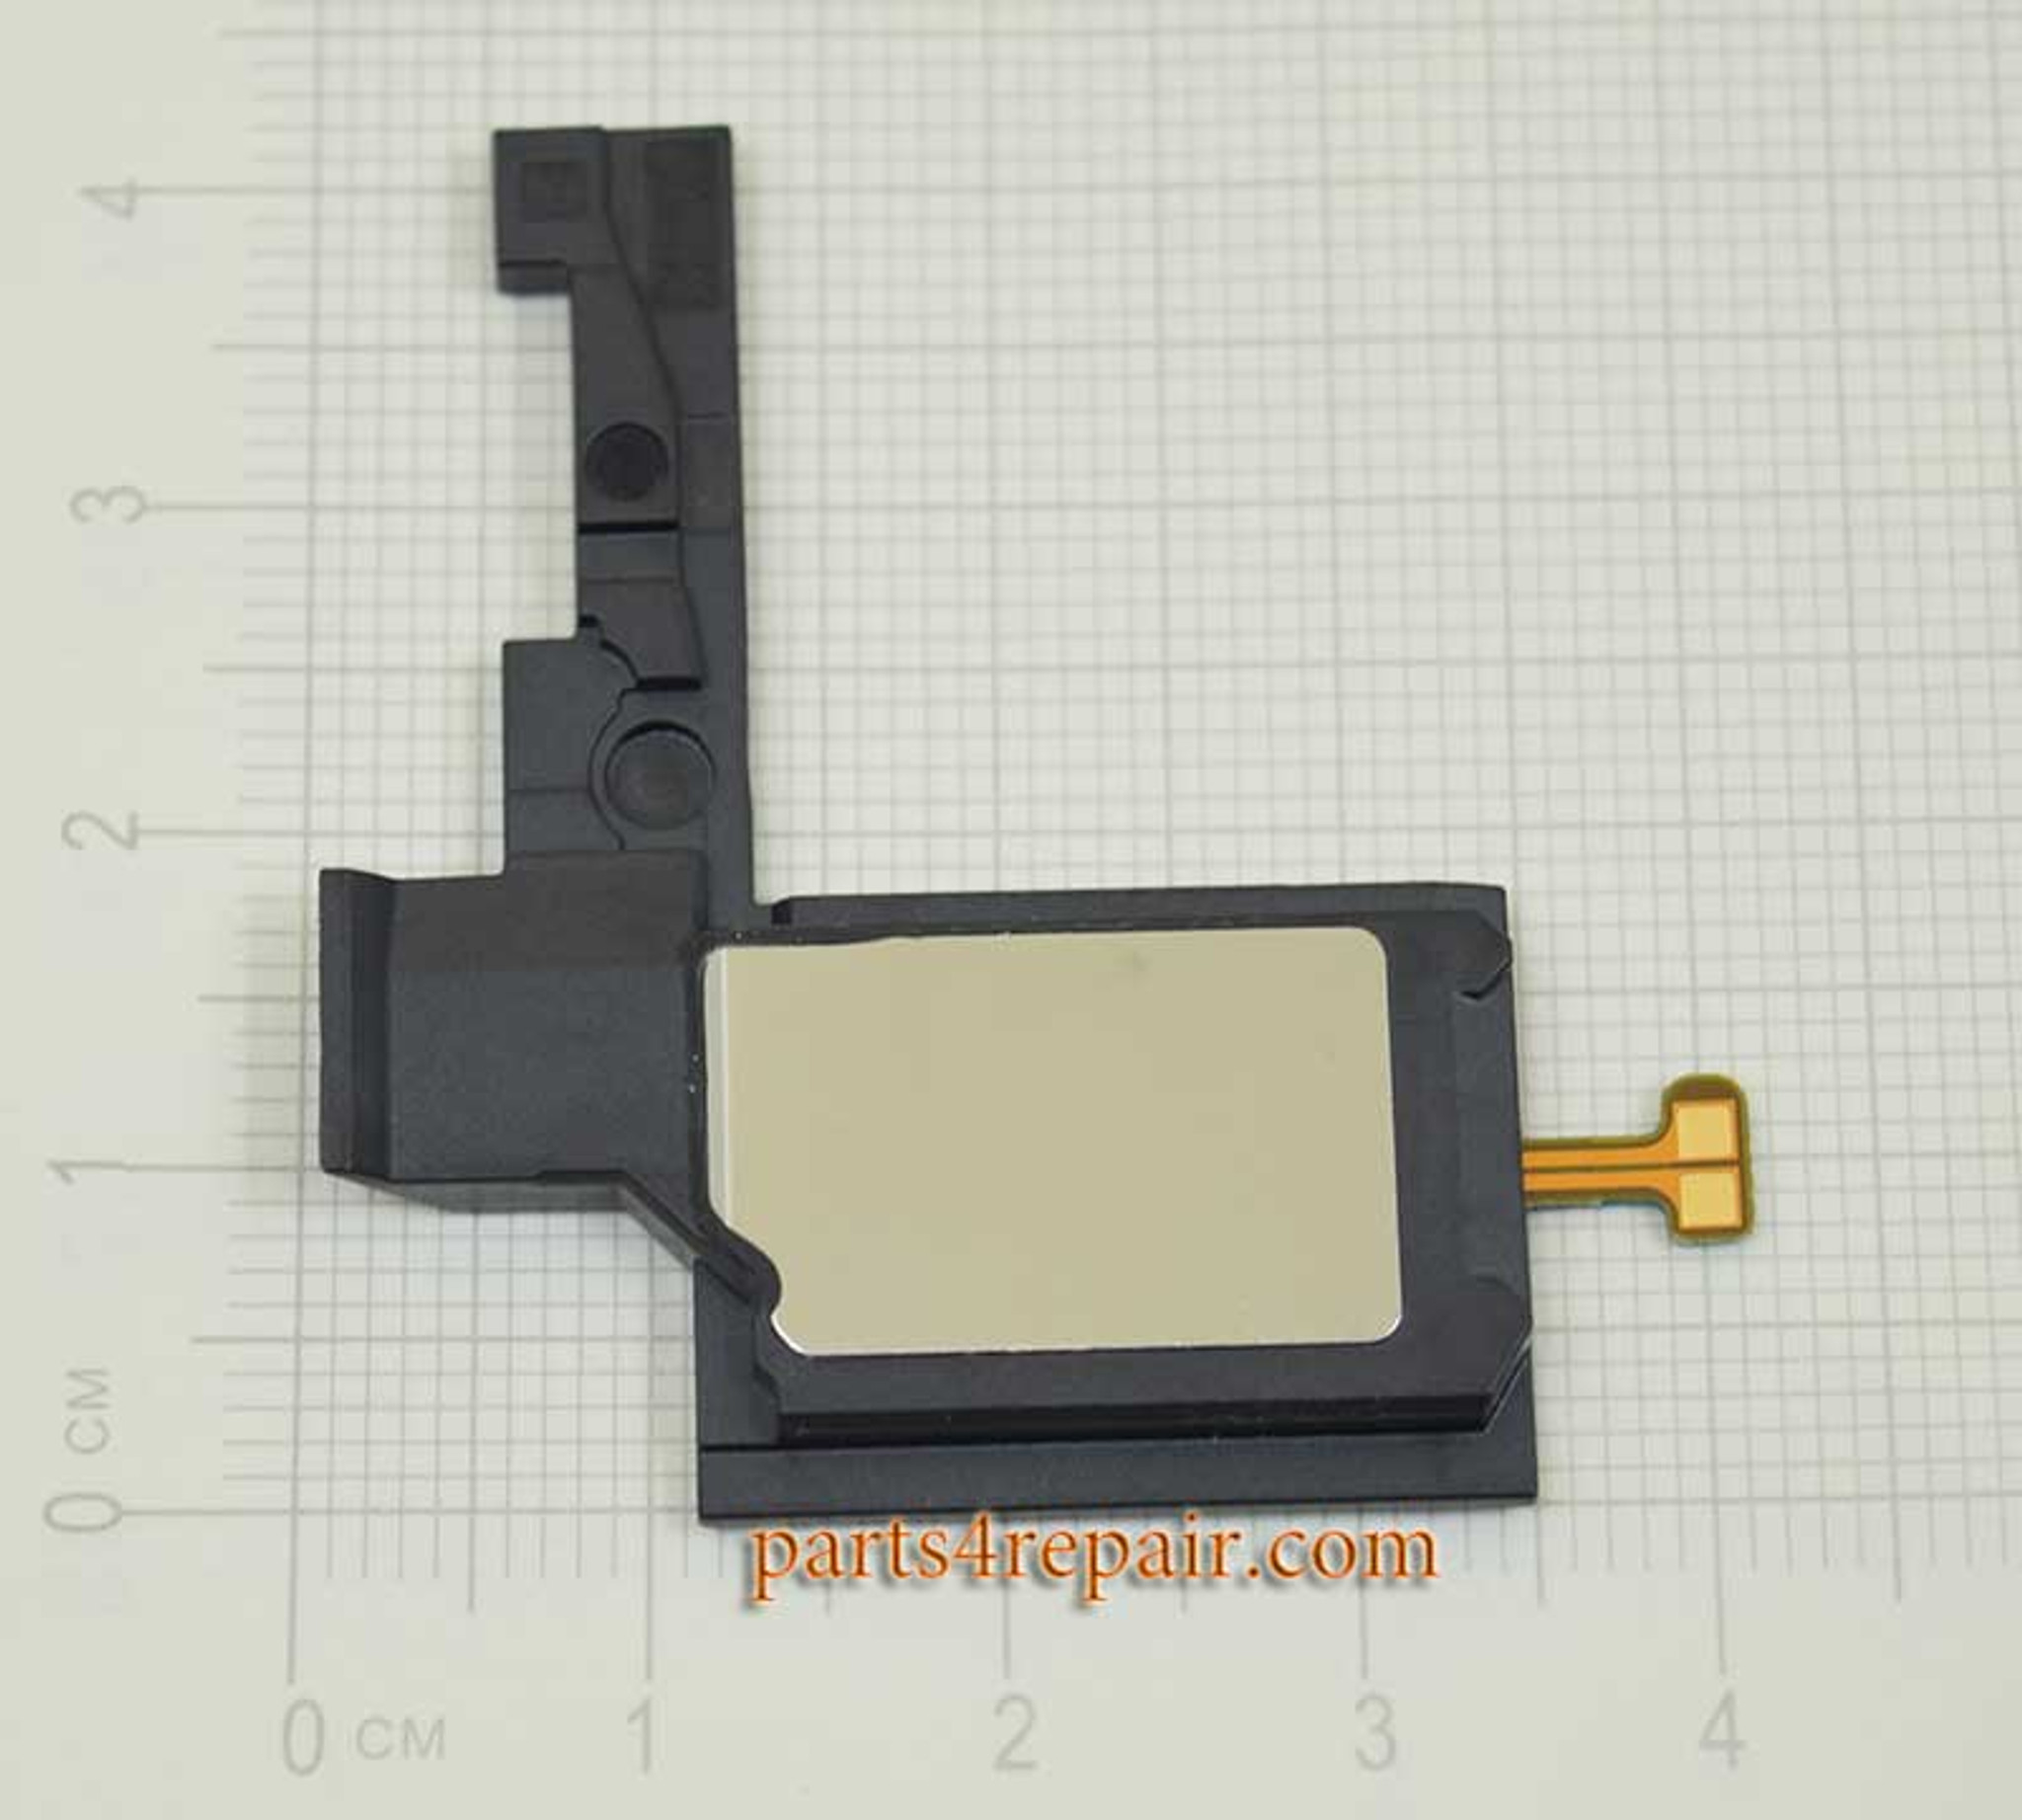 Module S6 Versions Samsung G925f Edge For Speaker Galaxy Loud All